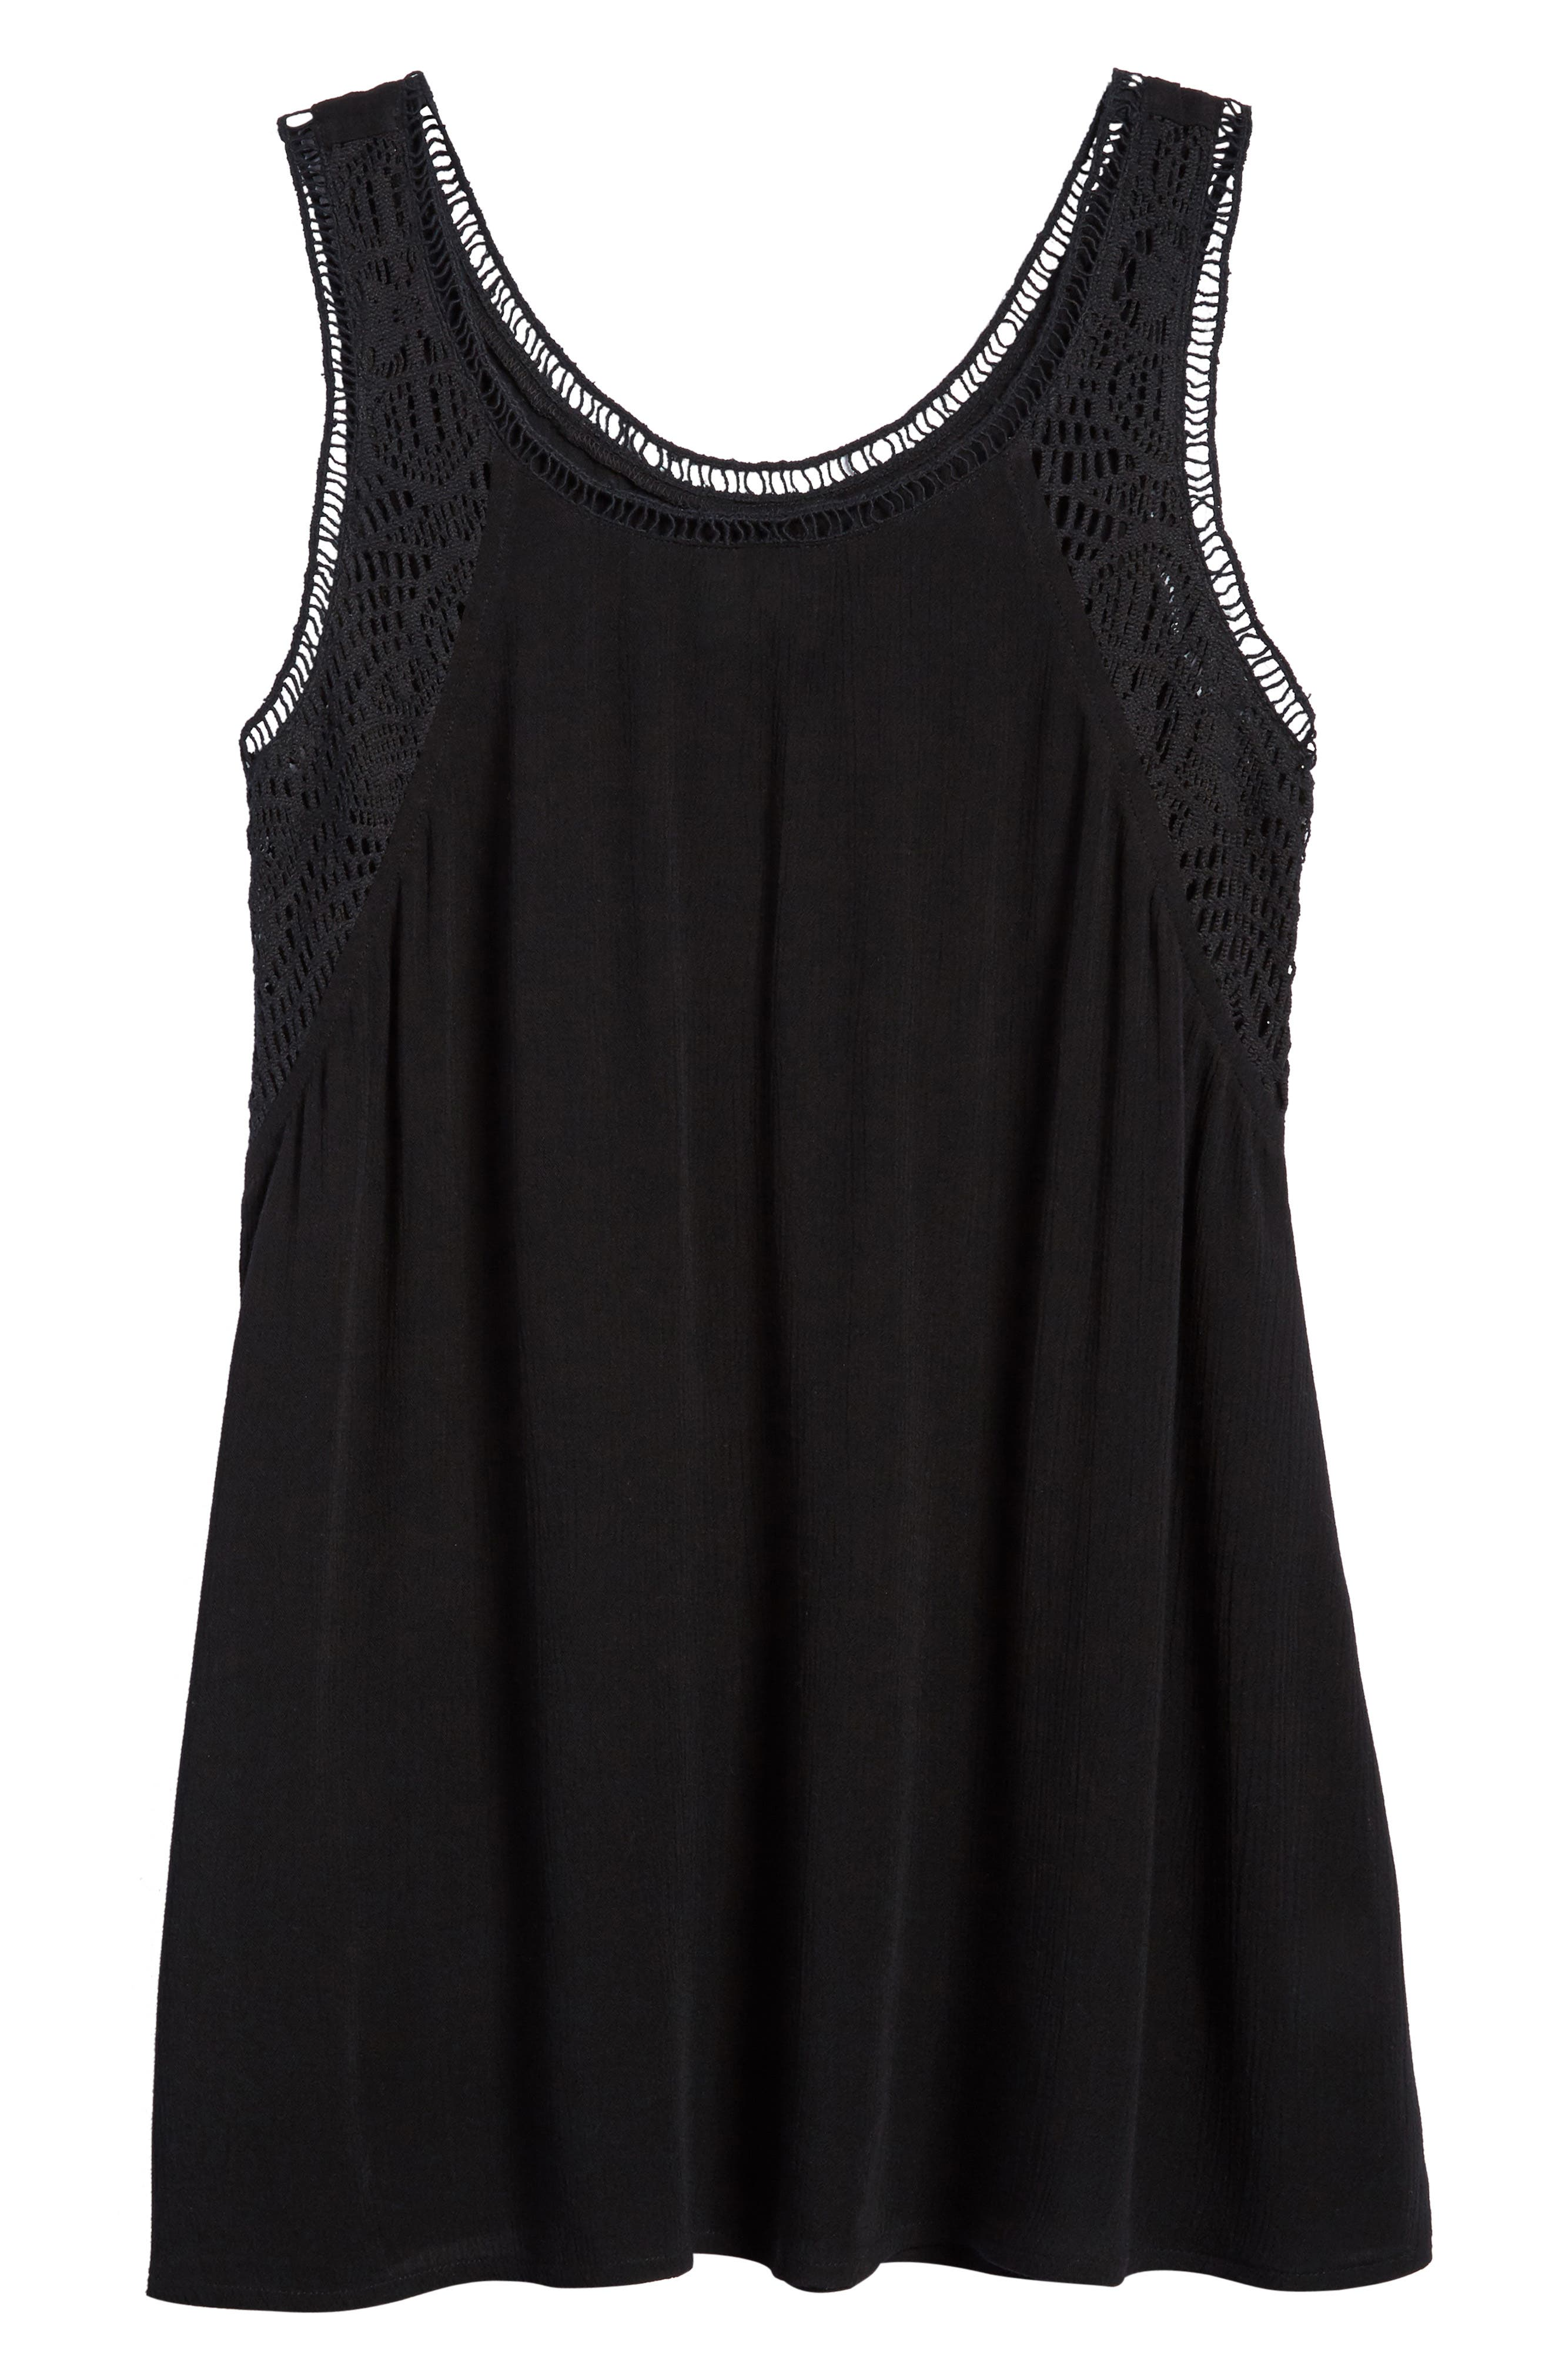 Alternate Image 1 Selected - O'Neill Addilyn Crochet Cover-Up Dress (Big Girls)